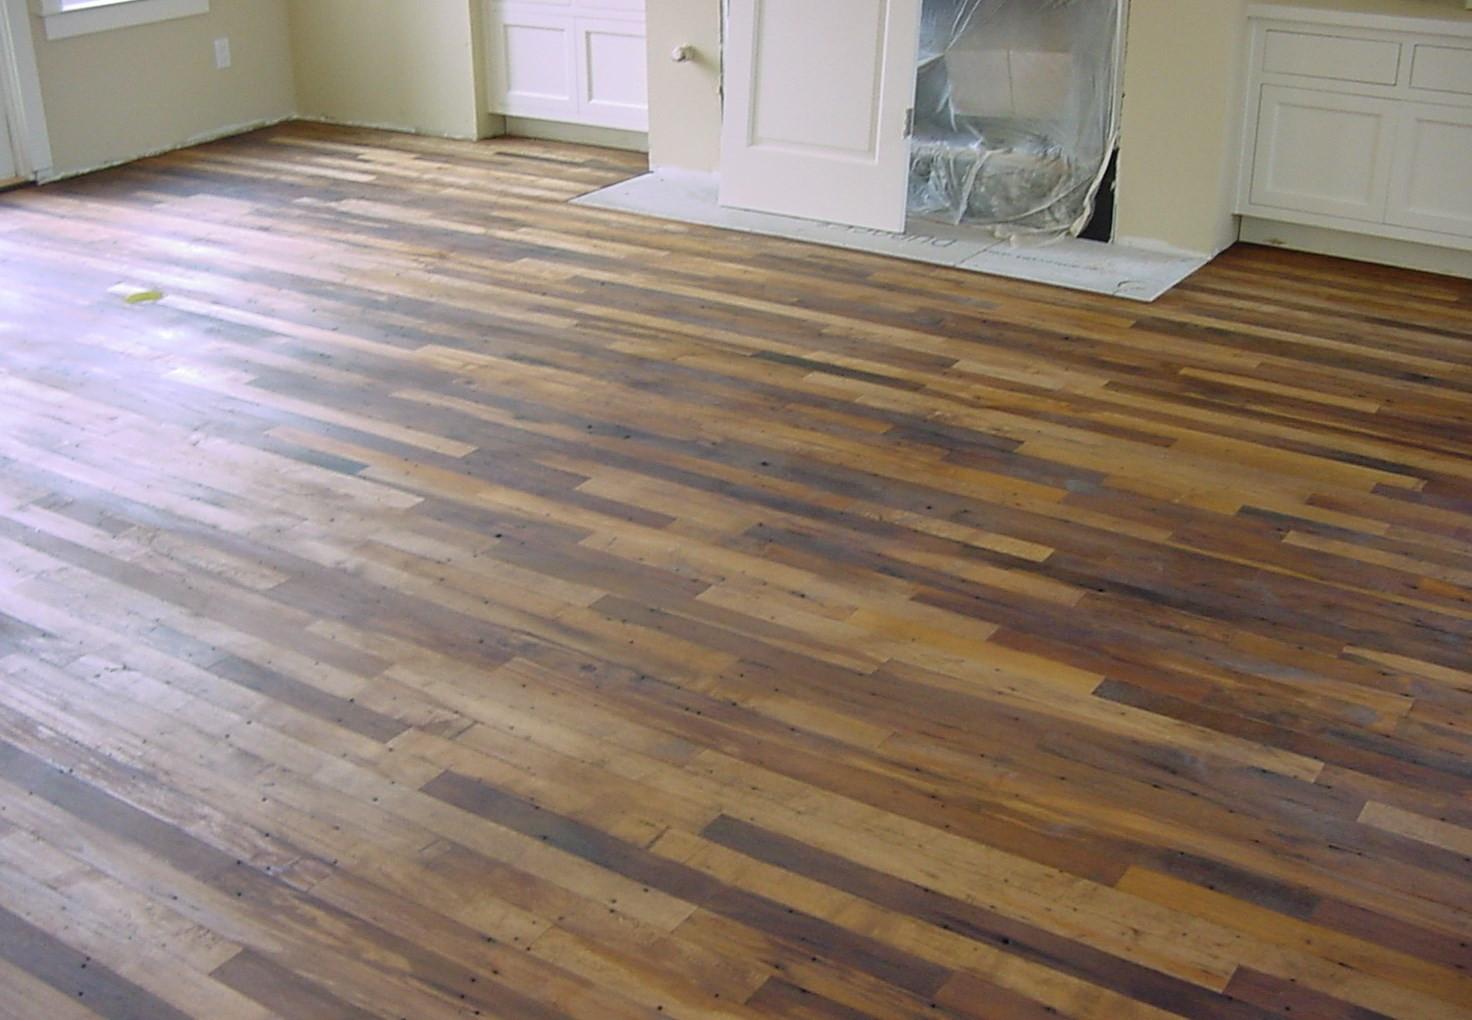 hardwood floor refinishing riverside ca of hardwood engineered laminate solid planks flooring installation for 1234567